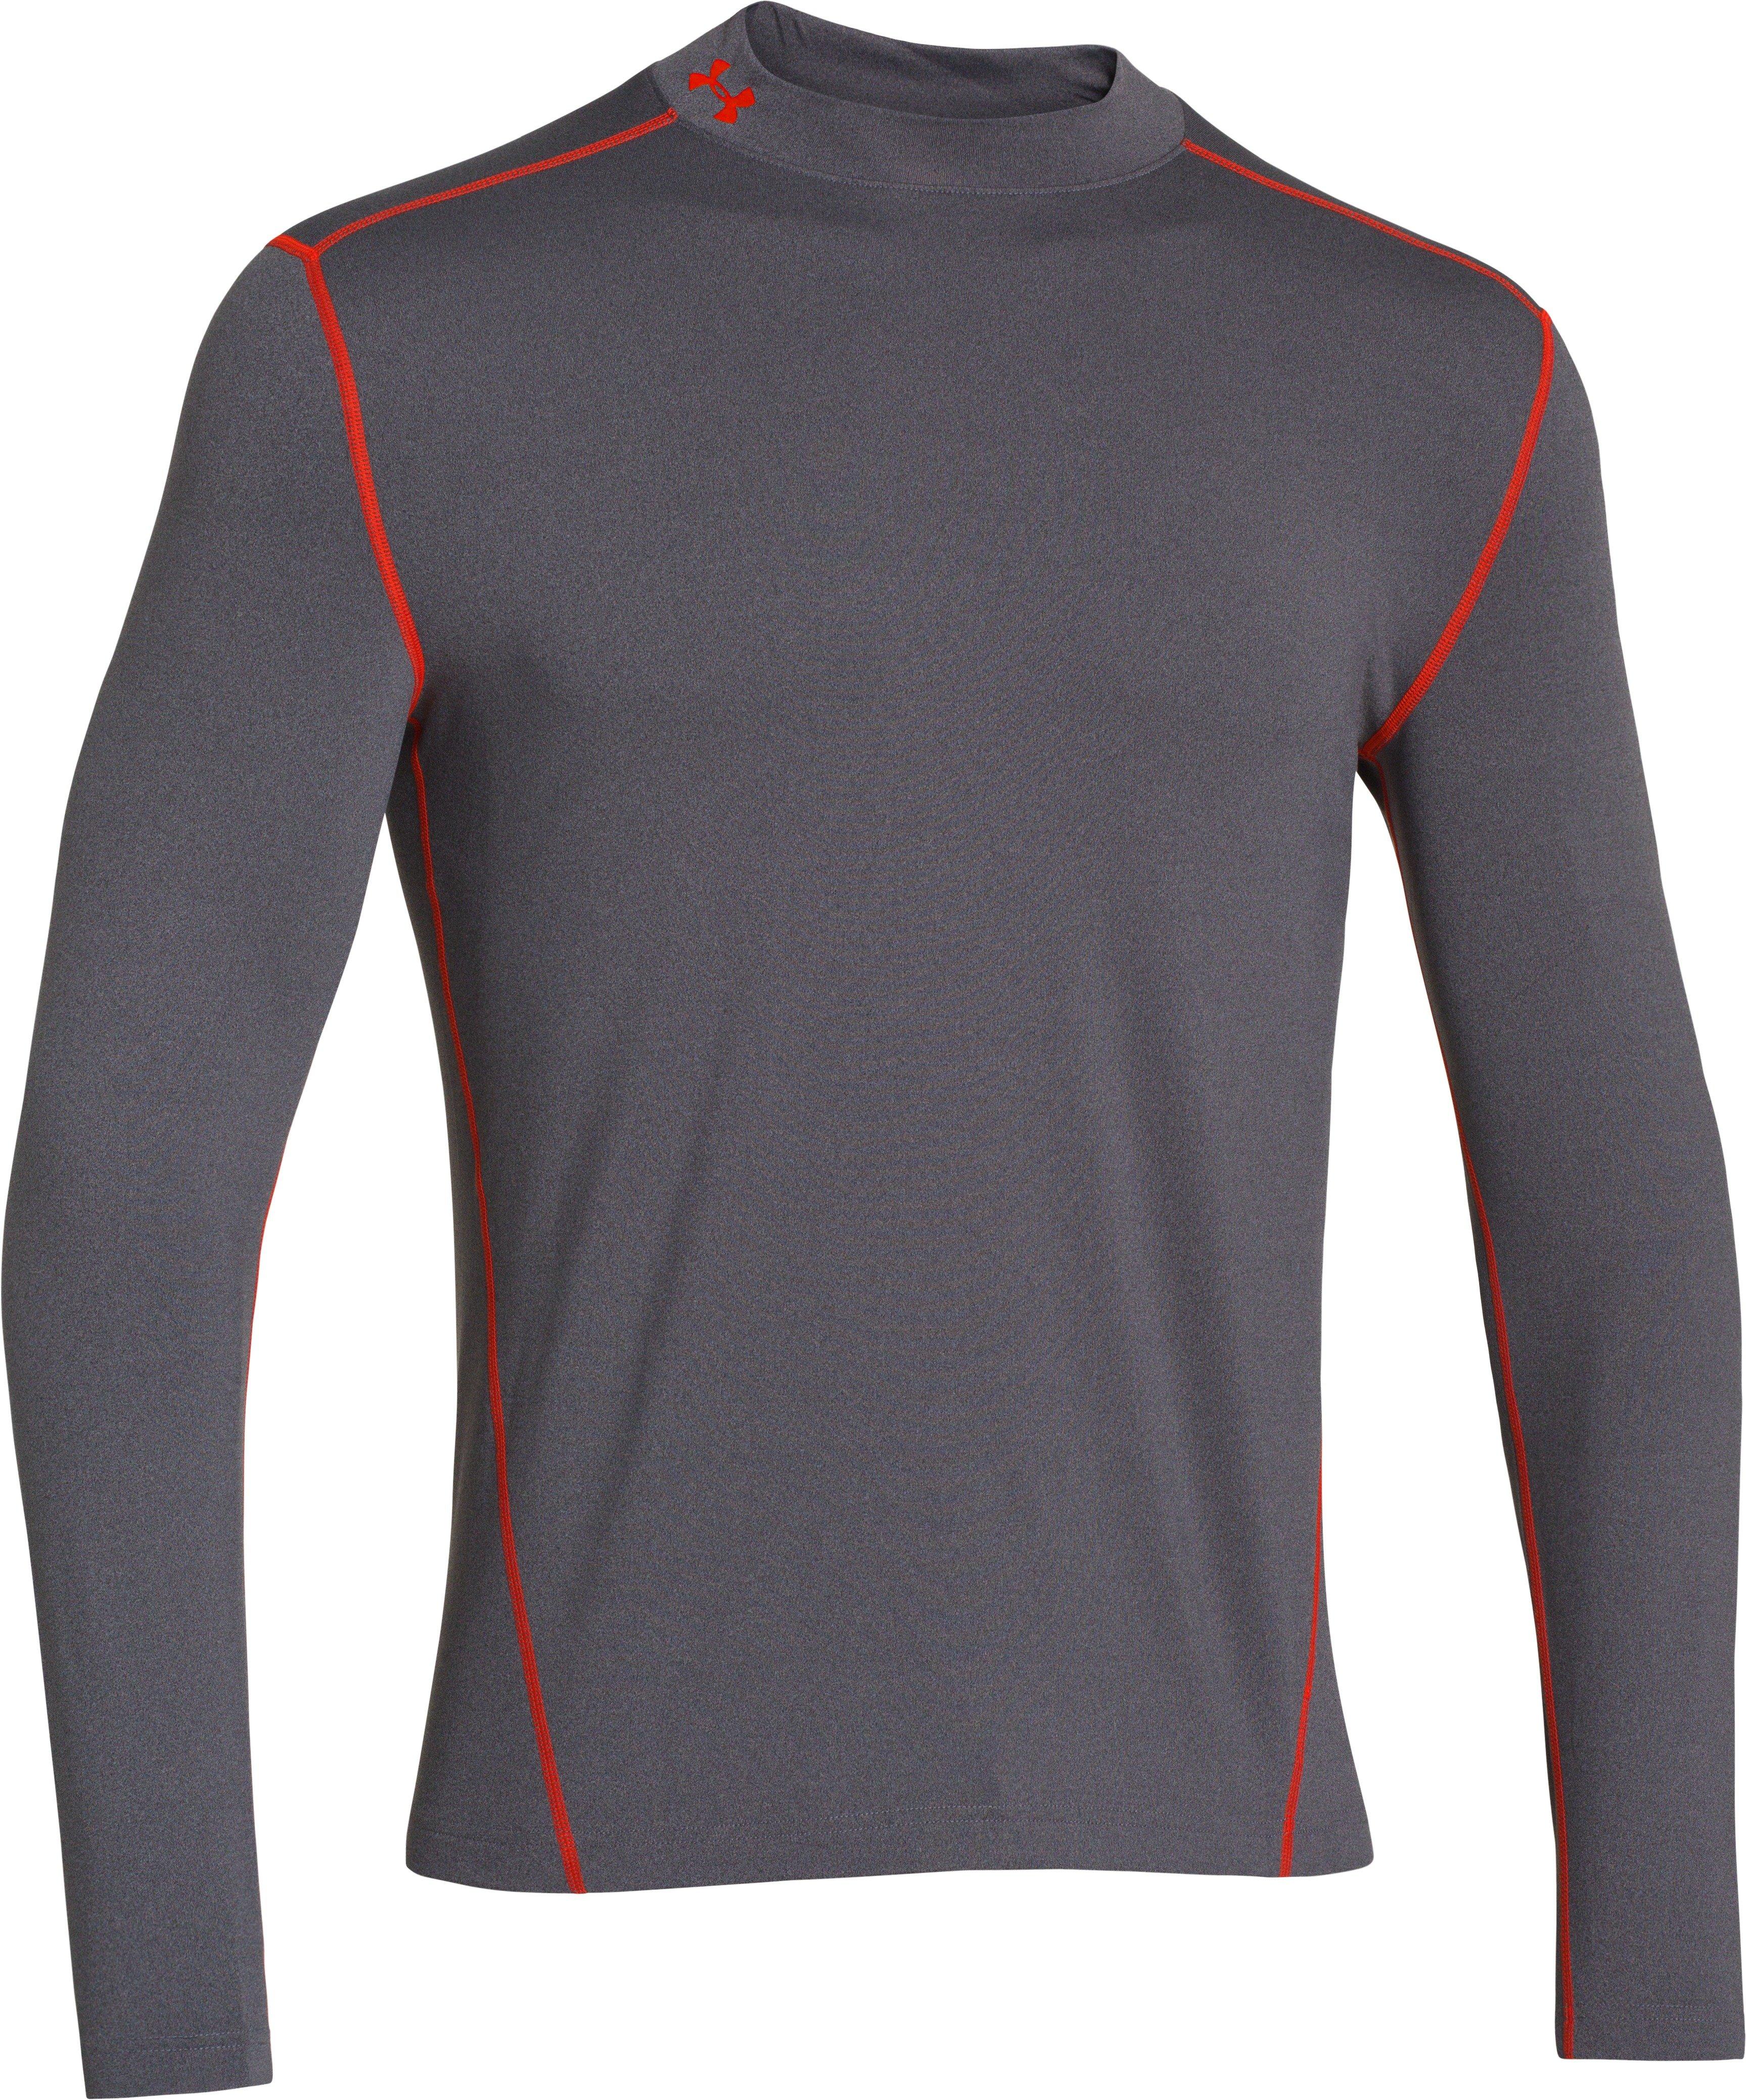 Under Armour Tee-Shirt UA Evo ColdGear M v�tement running homme